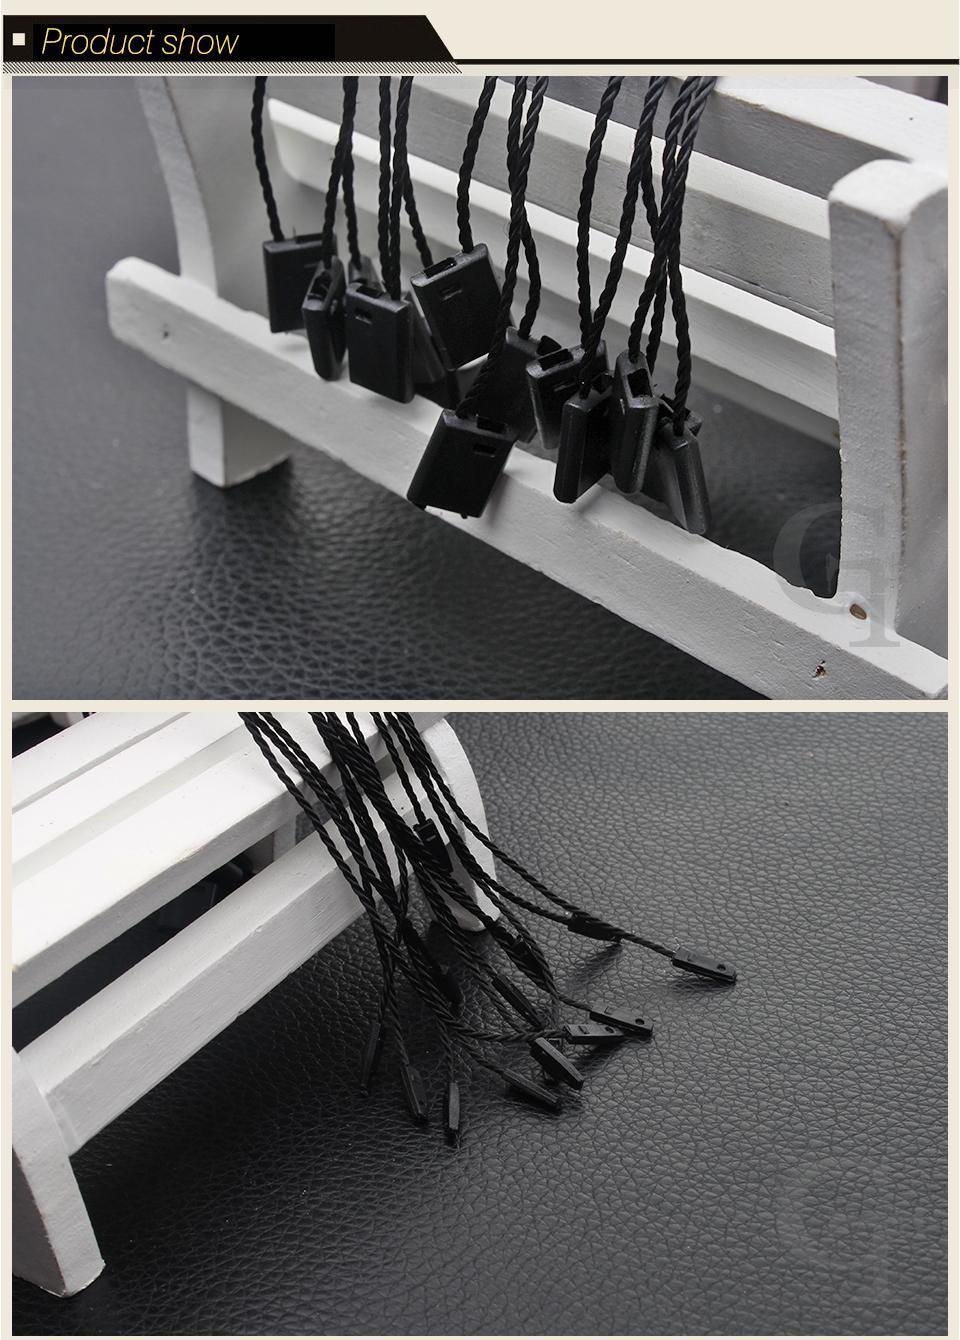 Großhandel Schwarz-Fall-Umbau Nylon String Saiten Kabel Snap Lock ...